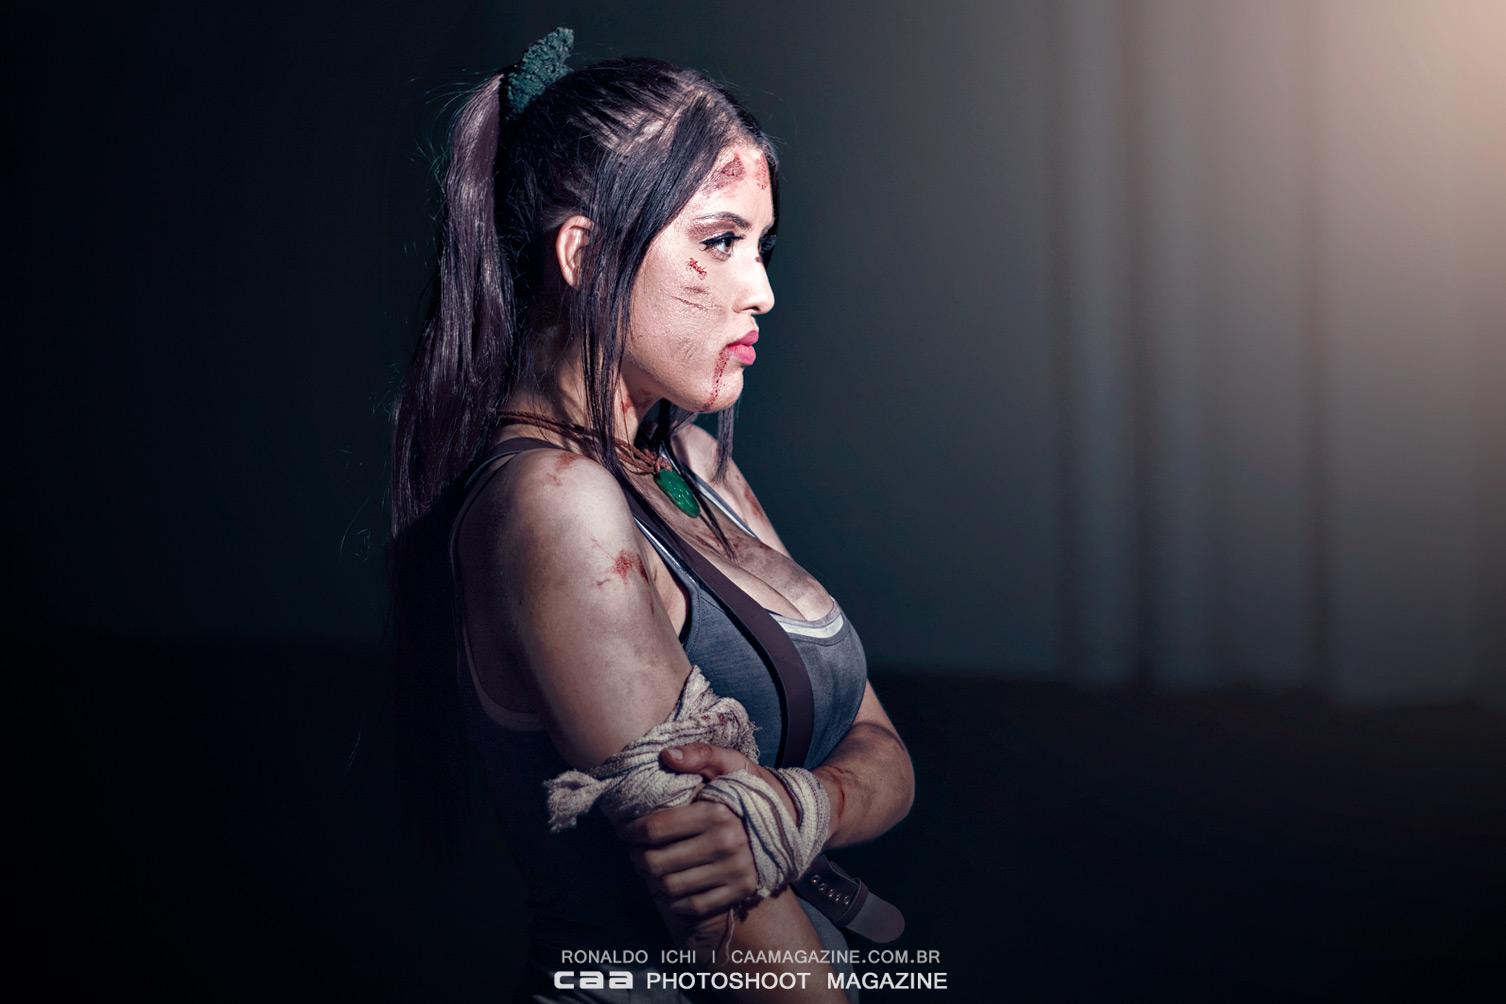 Lara Croft Tomb Raider 2013 Tomb Raider Cosplay